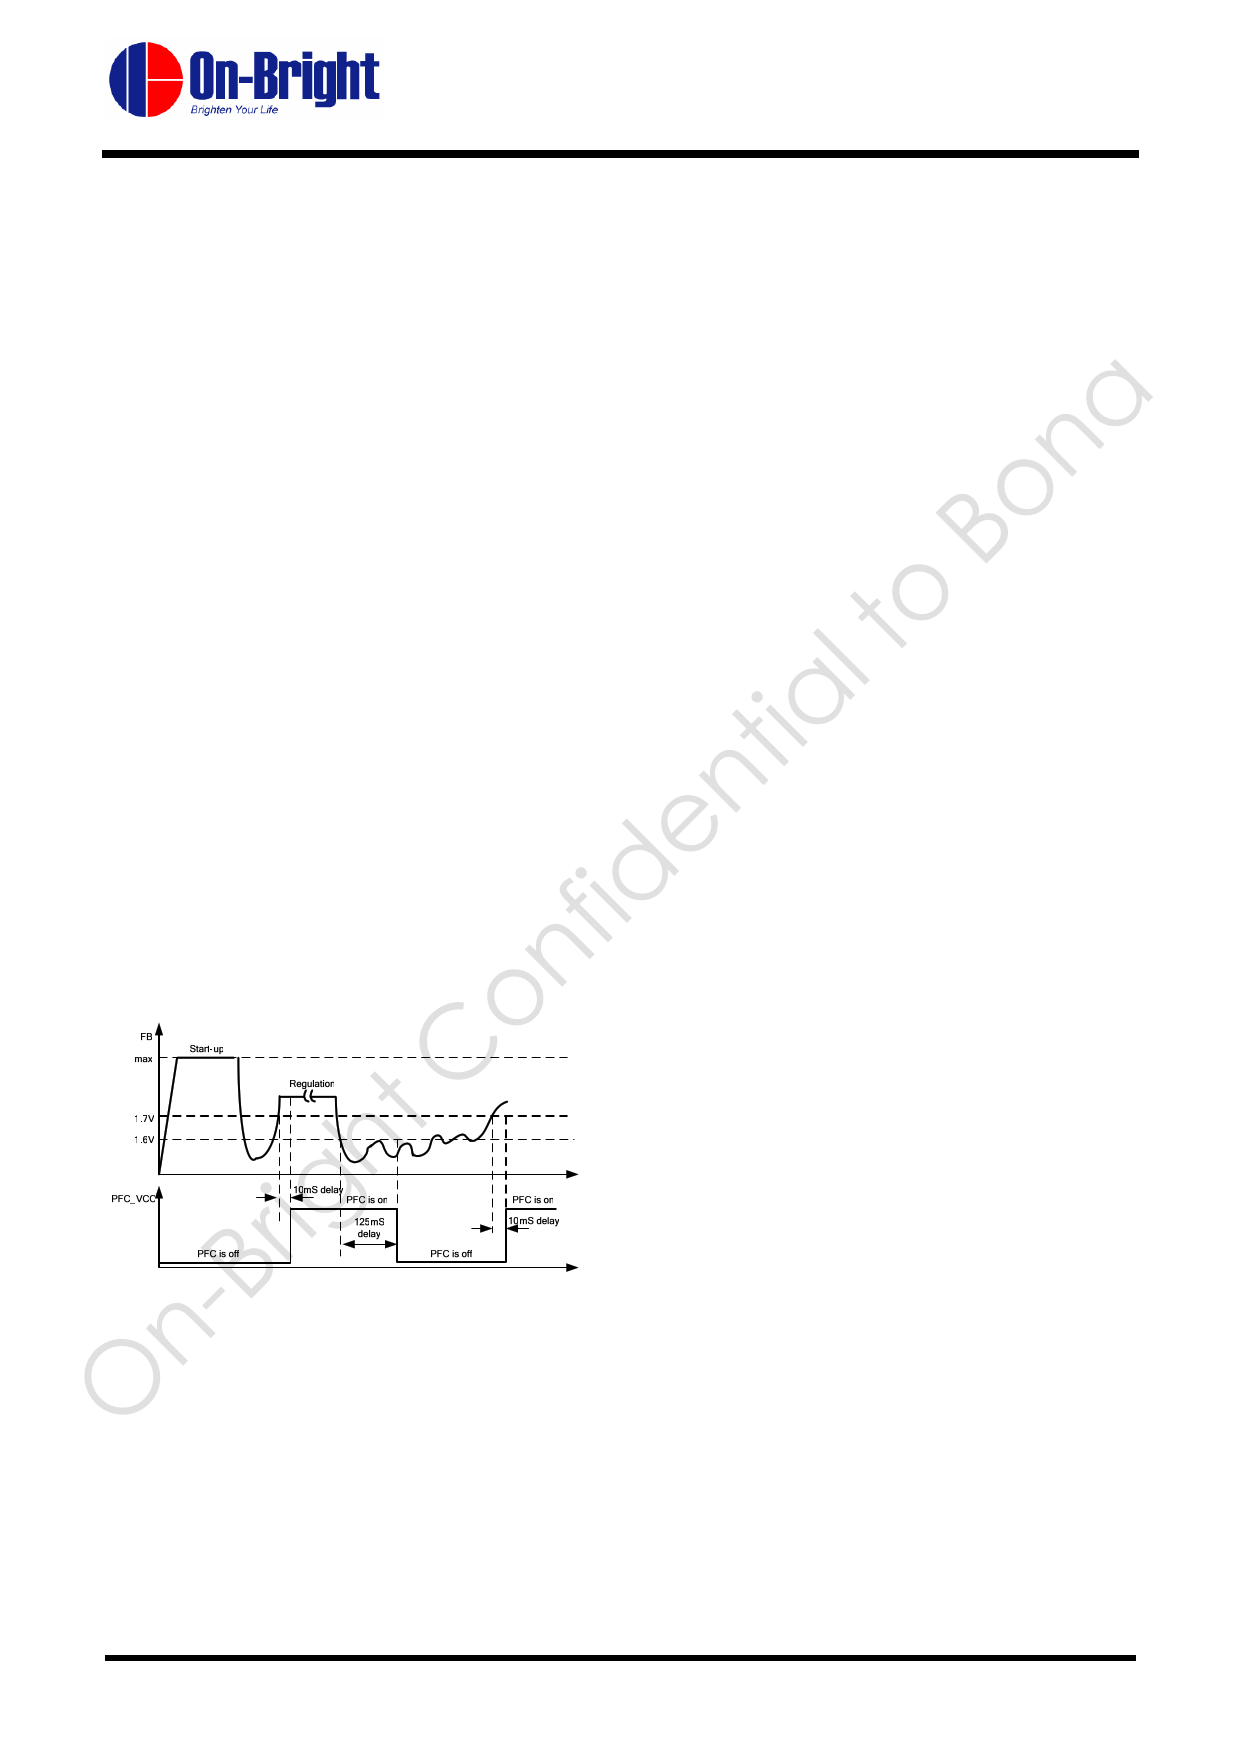 OB2298 arduino